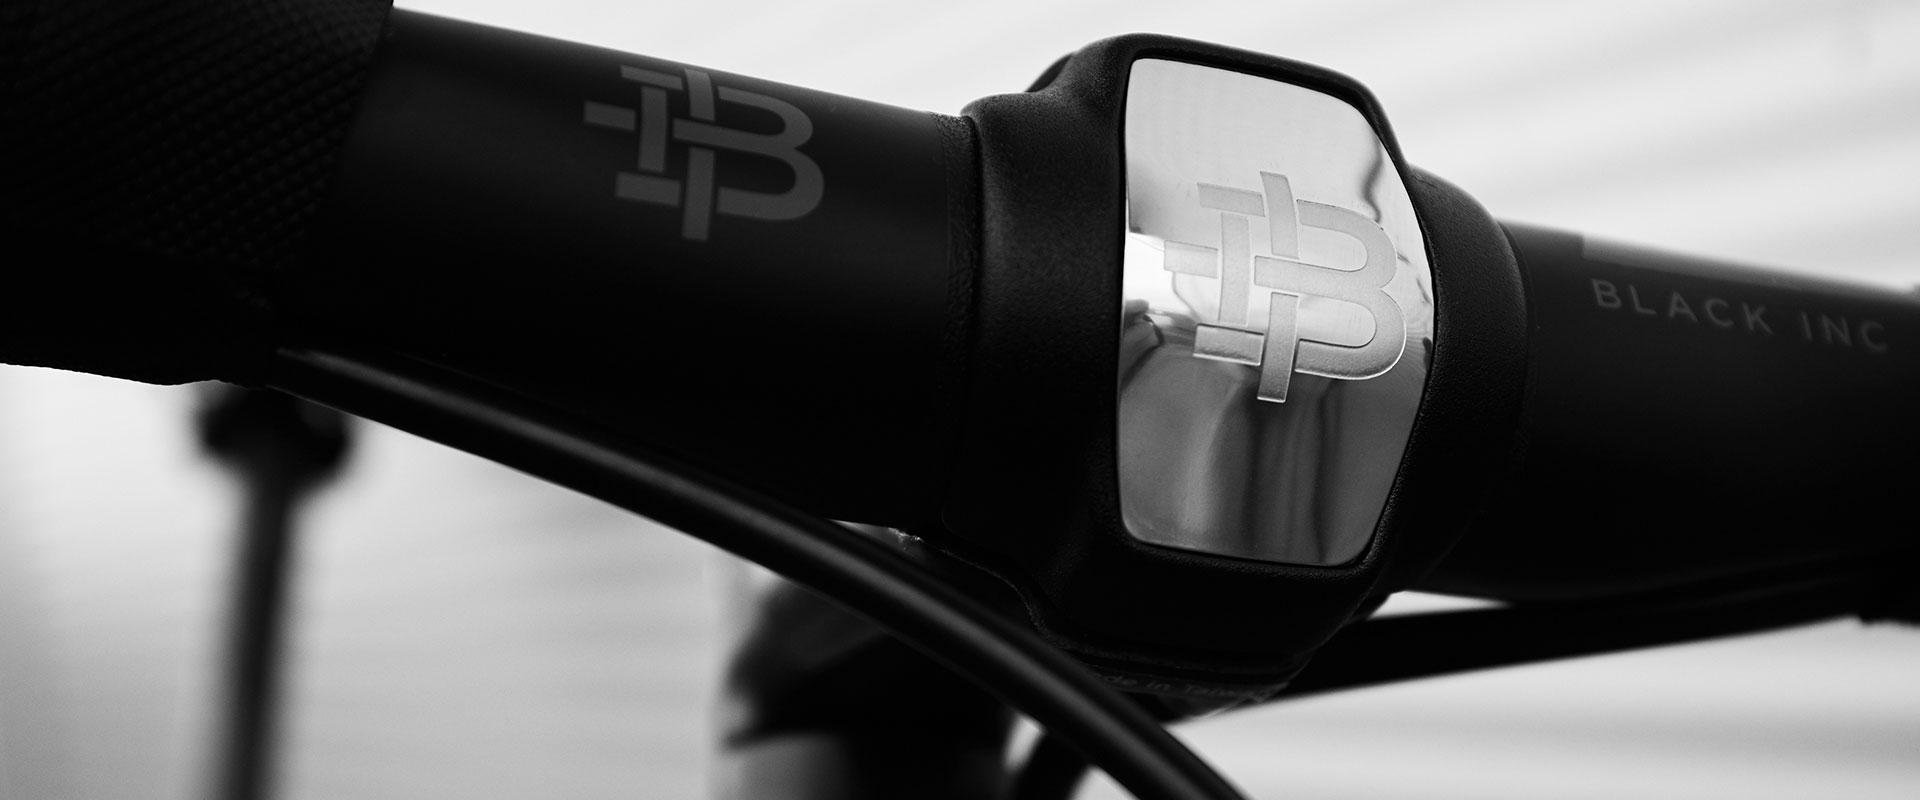 Black Inc -6D 100mm Carbon Road Stem